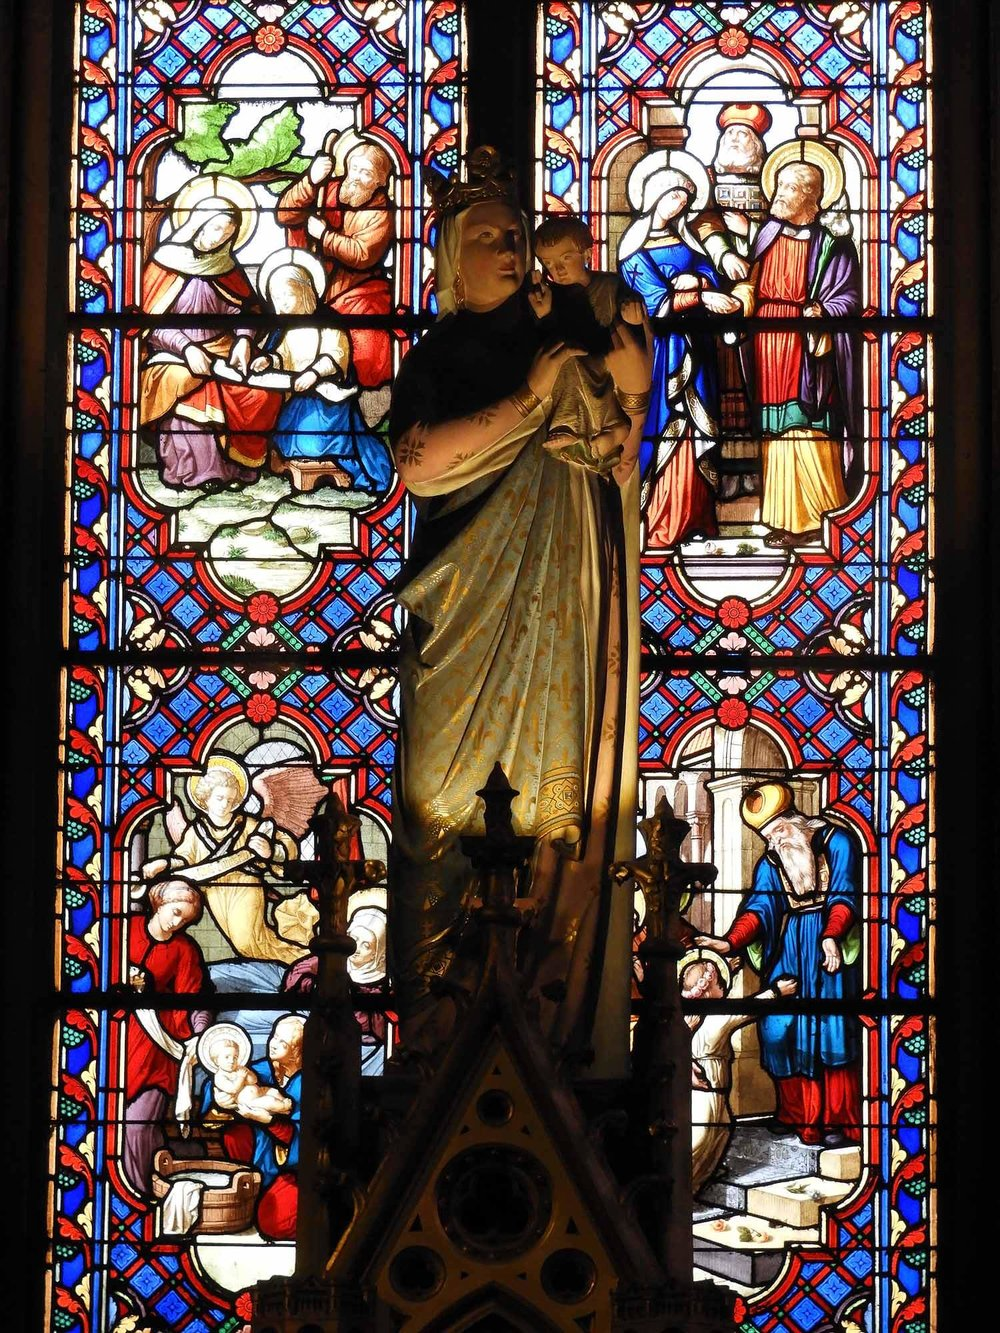 france-dijon-cathédrale-saint-bénigne-stained-glass.JPG